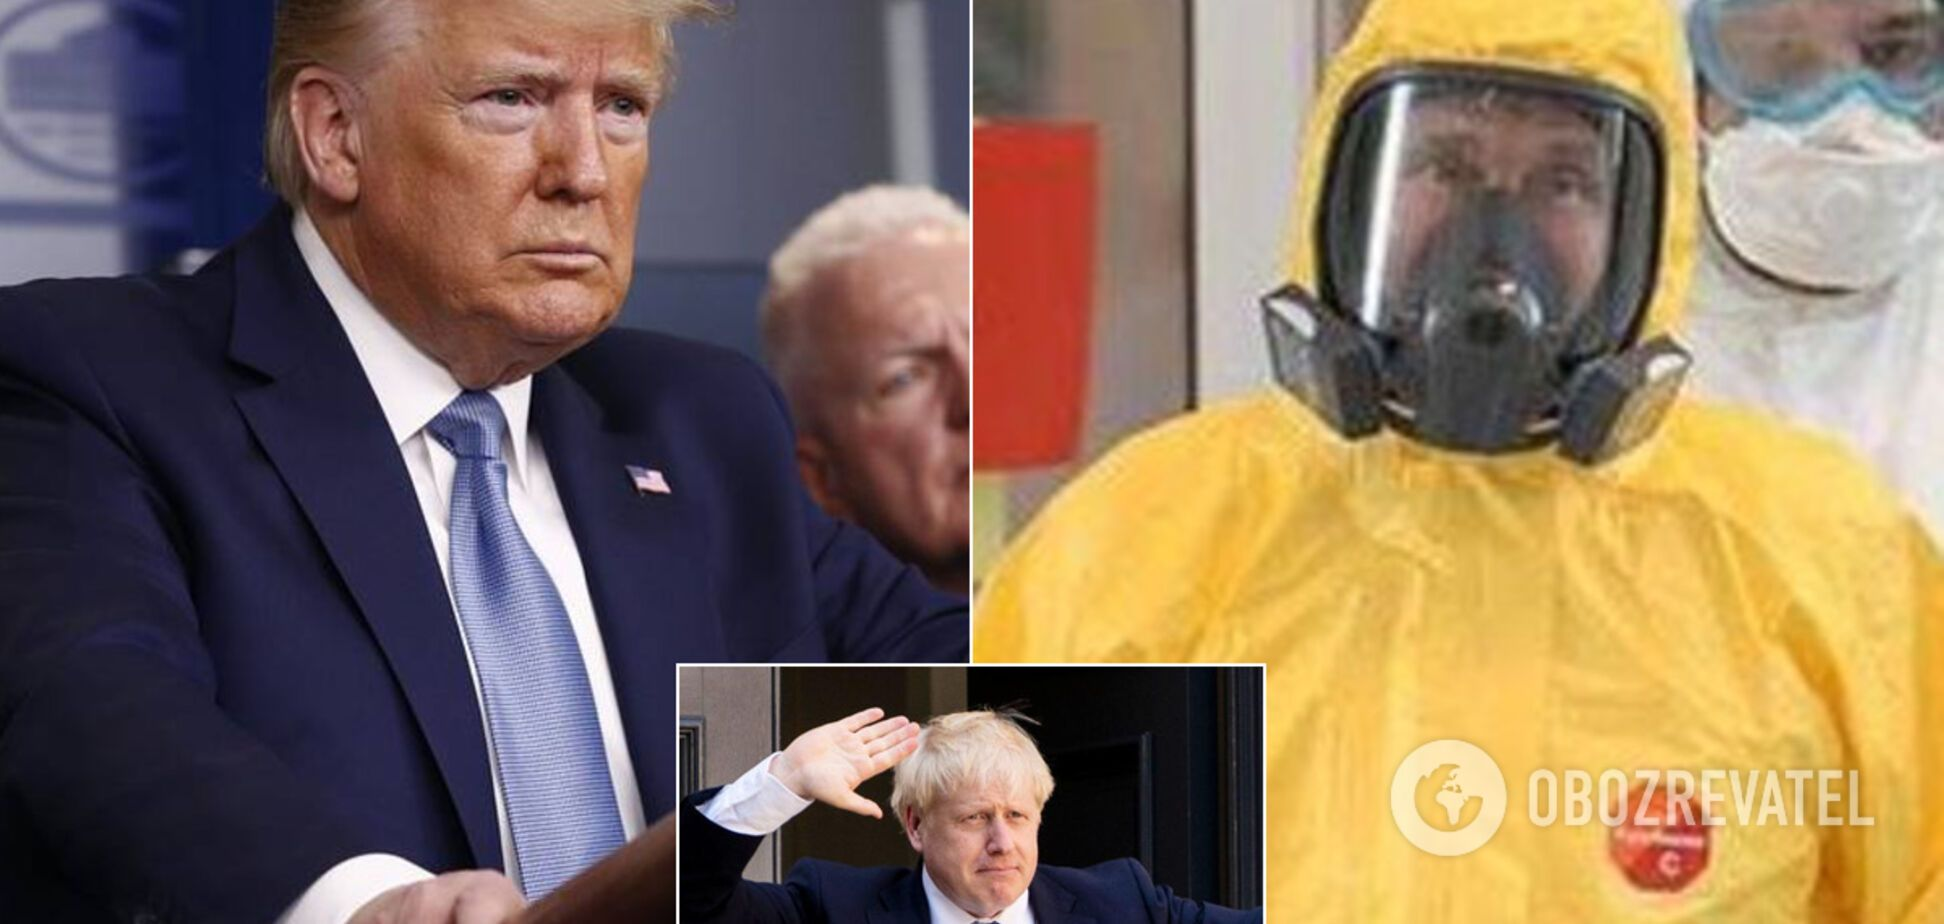 The Gurdian отчитала Путина, Трампа и Джонсона за 'мачизм' в период пандемии